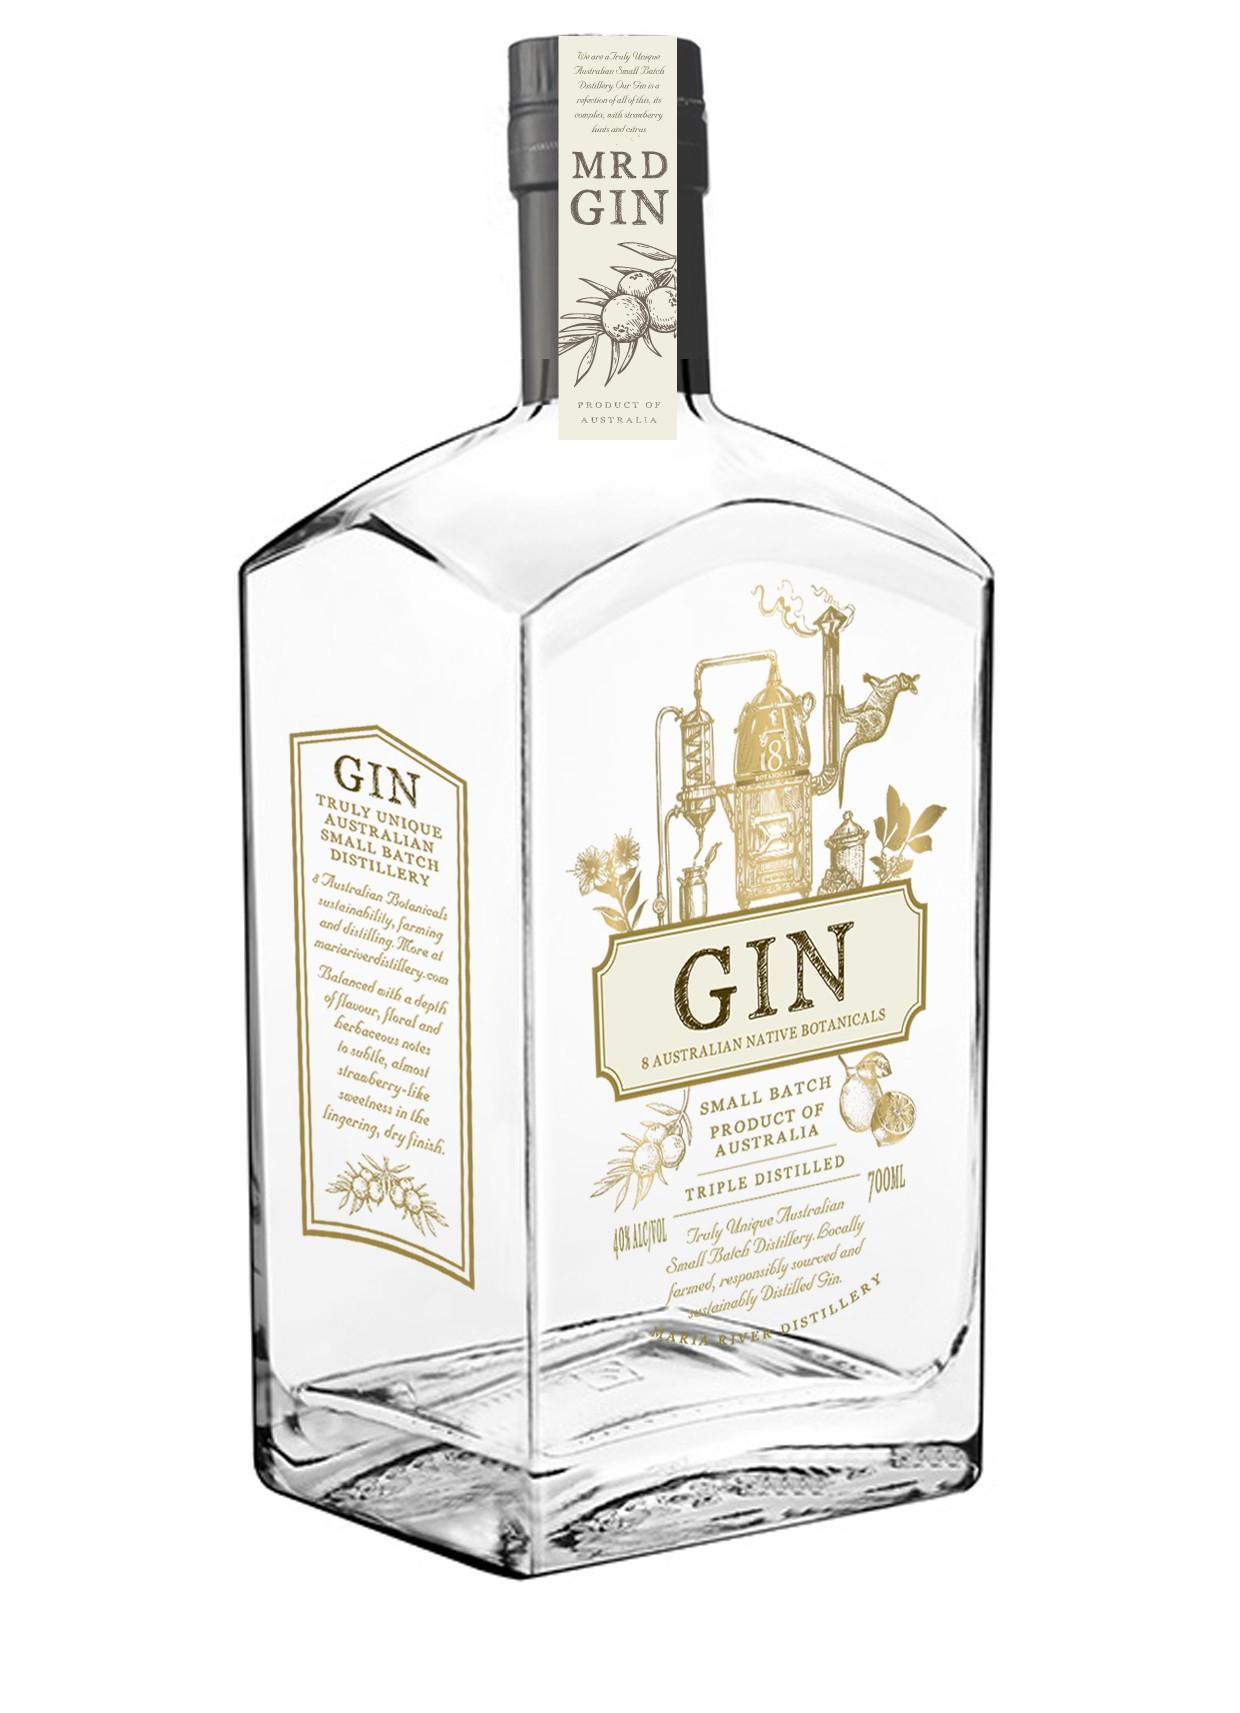 MRD Gin bottle visual